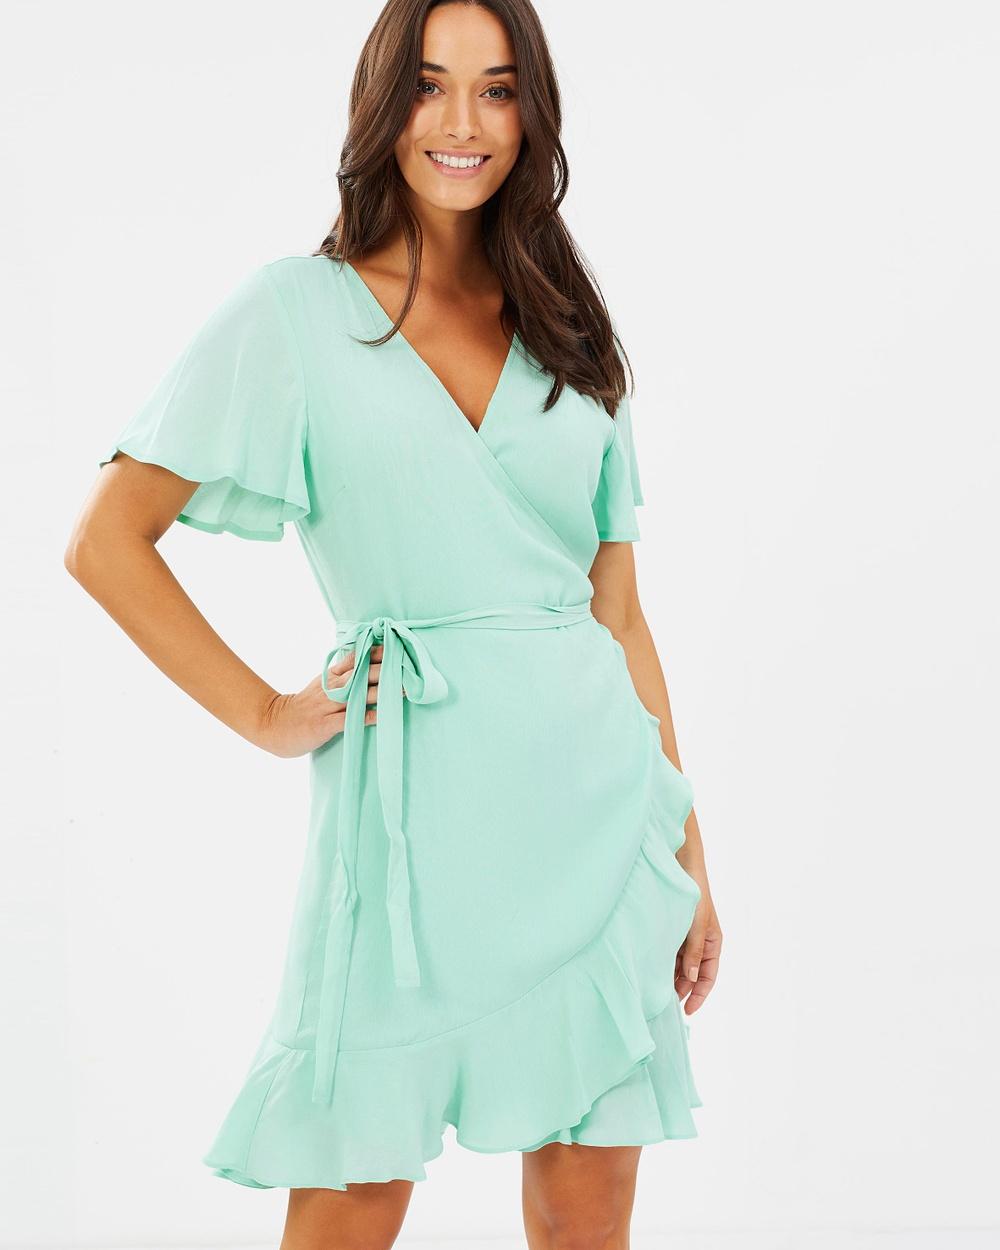 Fresh Soul Holiday Wrap Dress Dresses Mint Holiday Wrap Dress